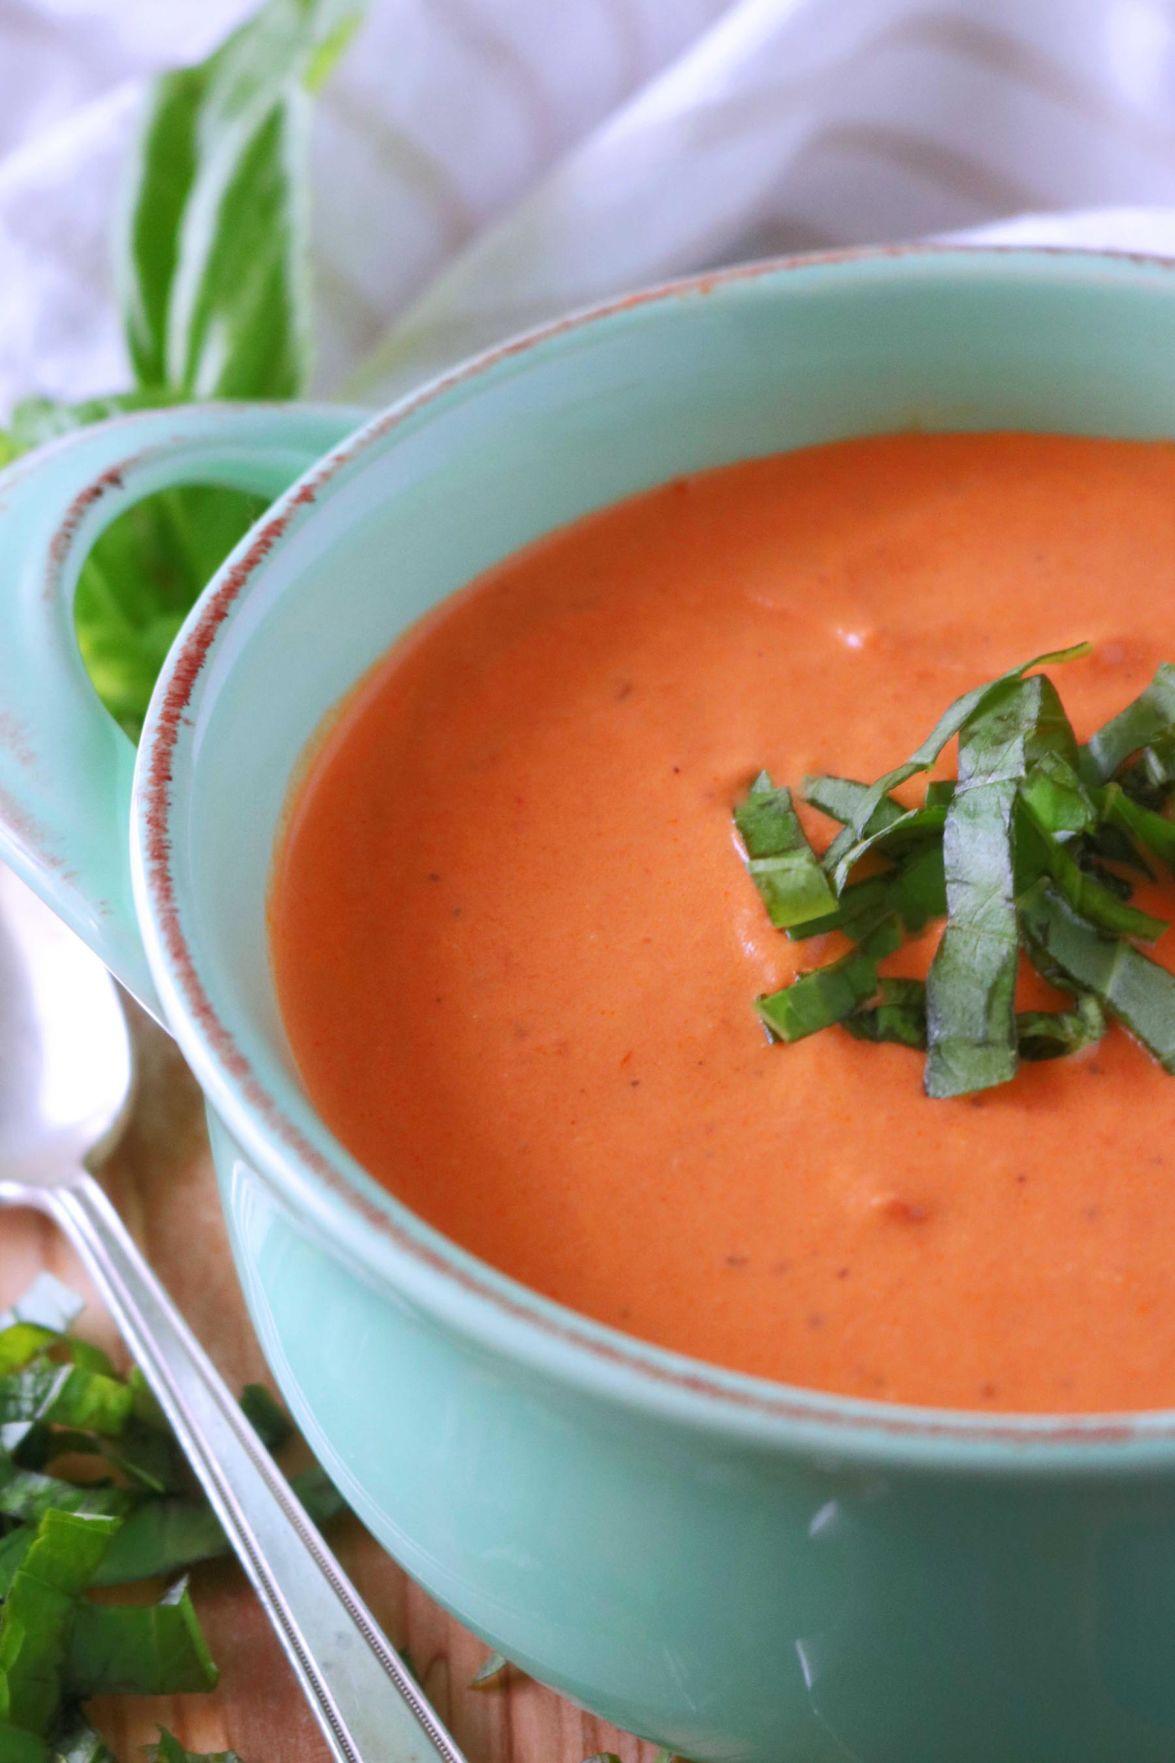 Kelly Anthony: Homemade tomato soup